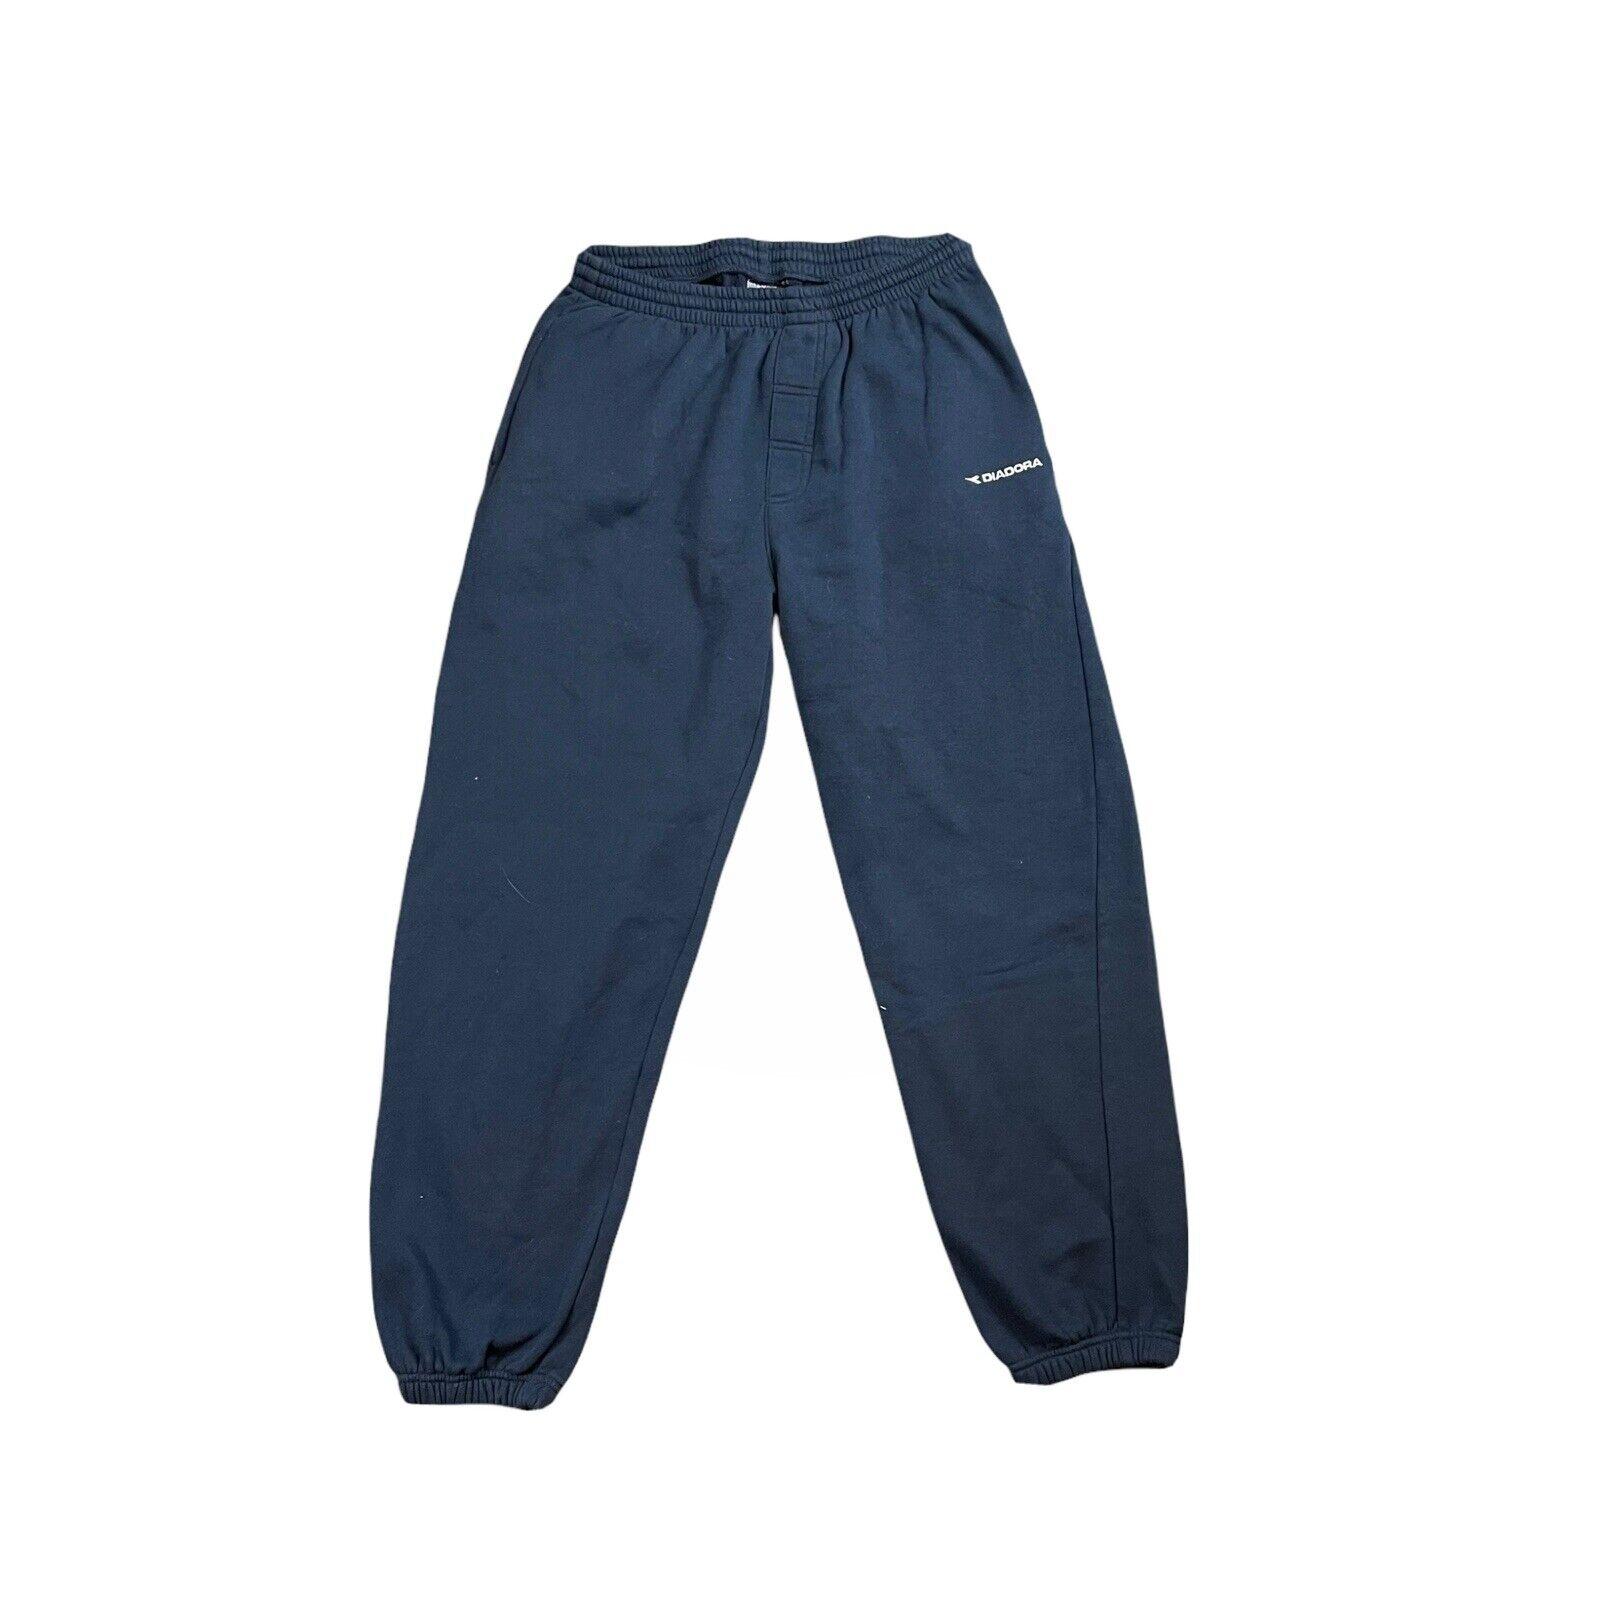 Diadora Blue White Embroidered Jogging Bottoms Sweatpants Size Mens XL